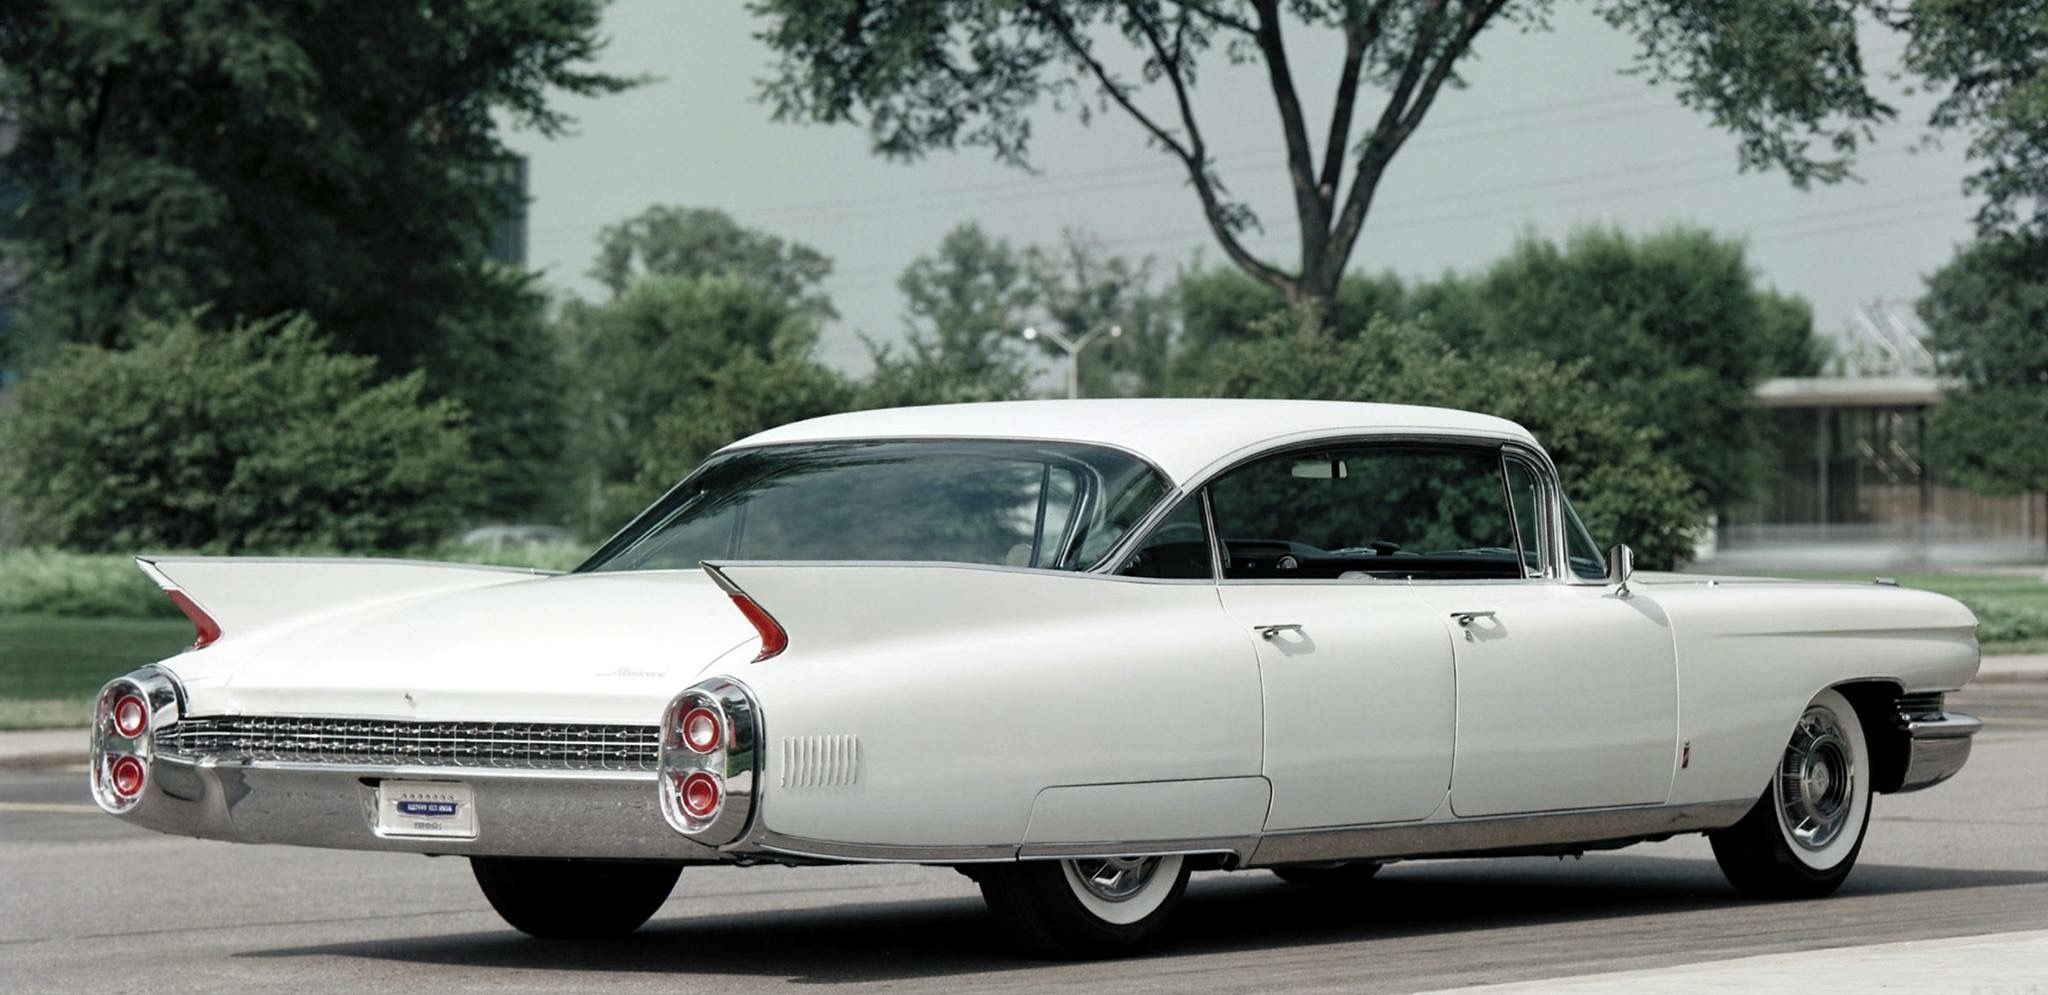 Cadillac Countryside - Shjones Ohmsjones